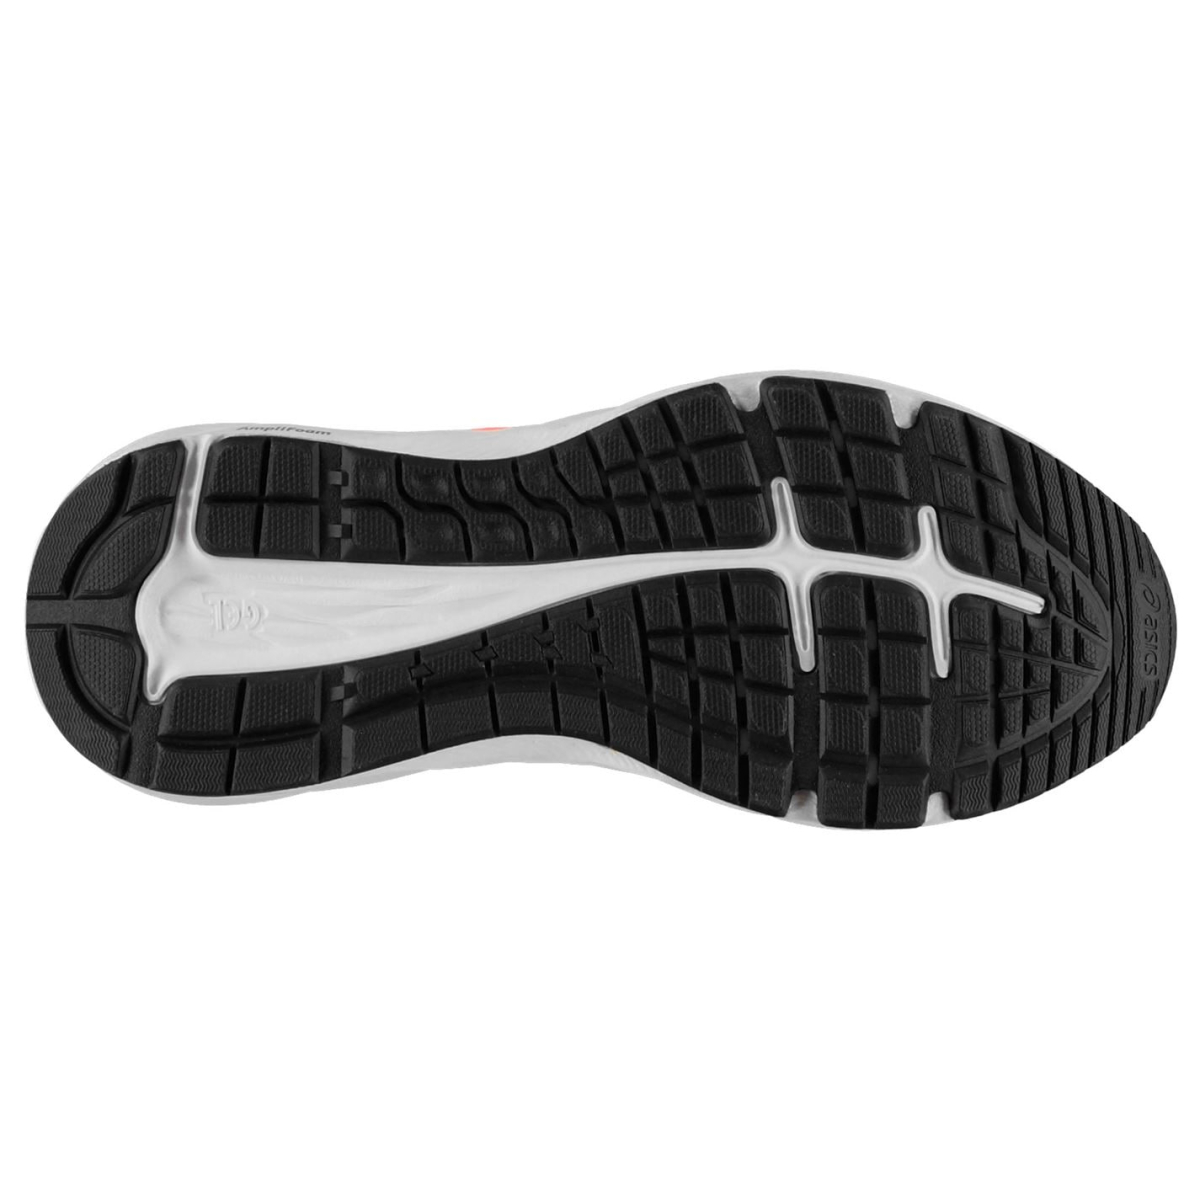 Asics-Gel-Excite-6-Laufschuhe-Damen-Sportschuhe-Turnschuhe-Jogging-4710 Indexbild 9